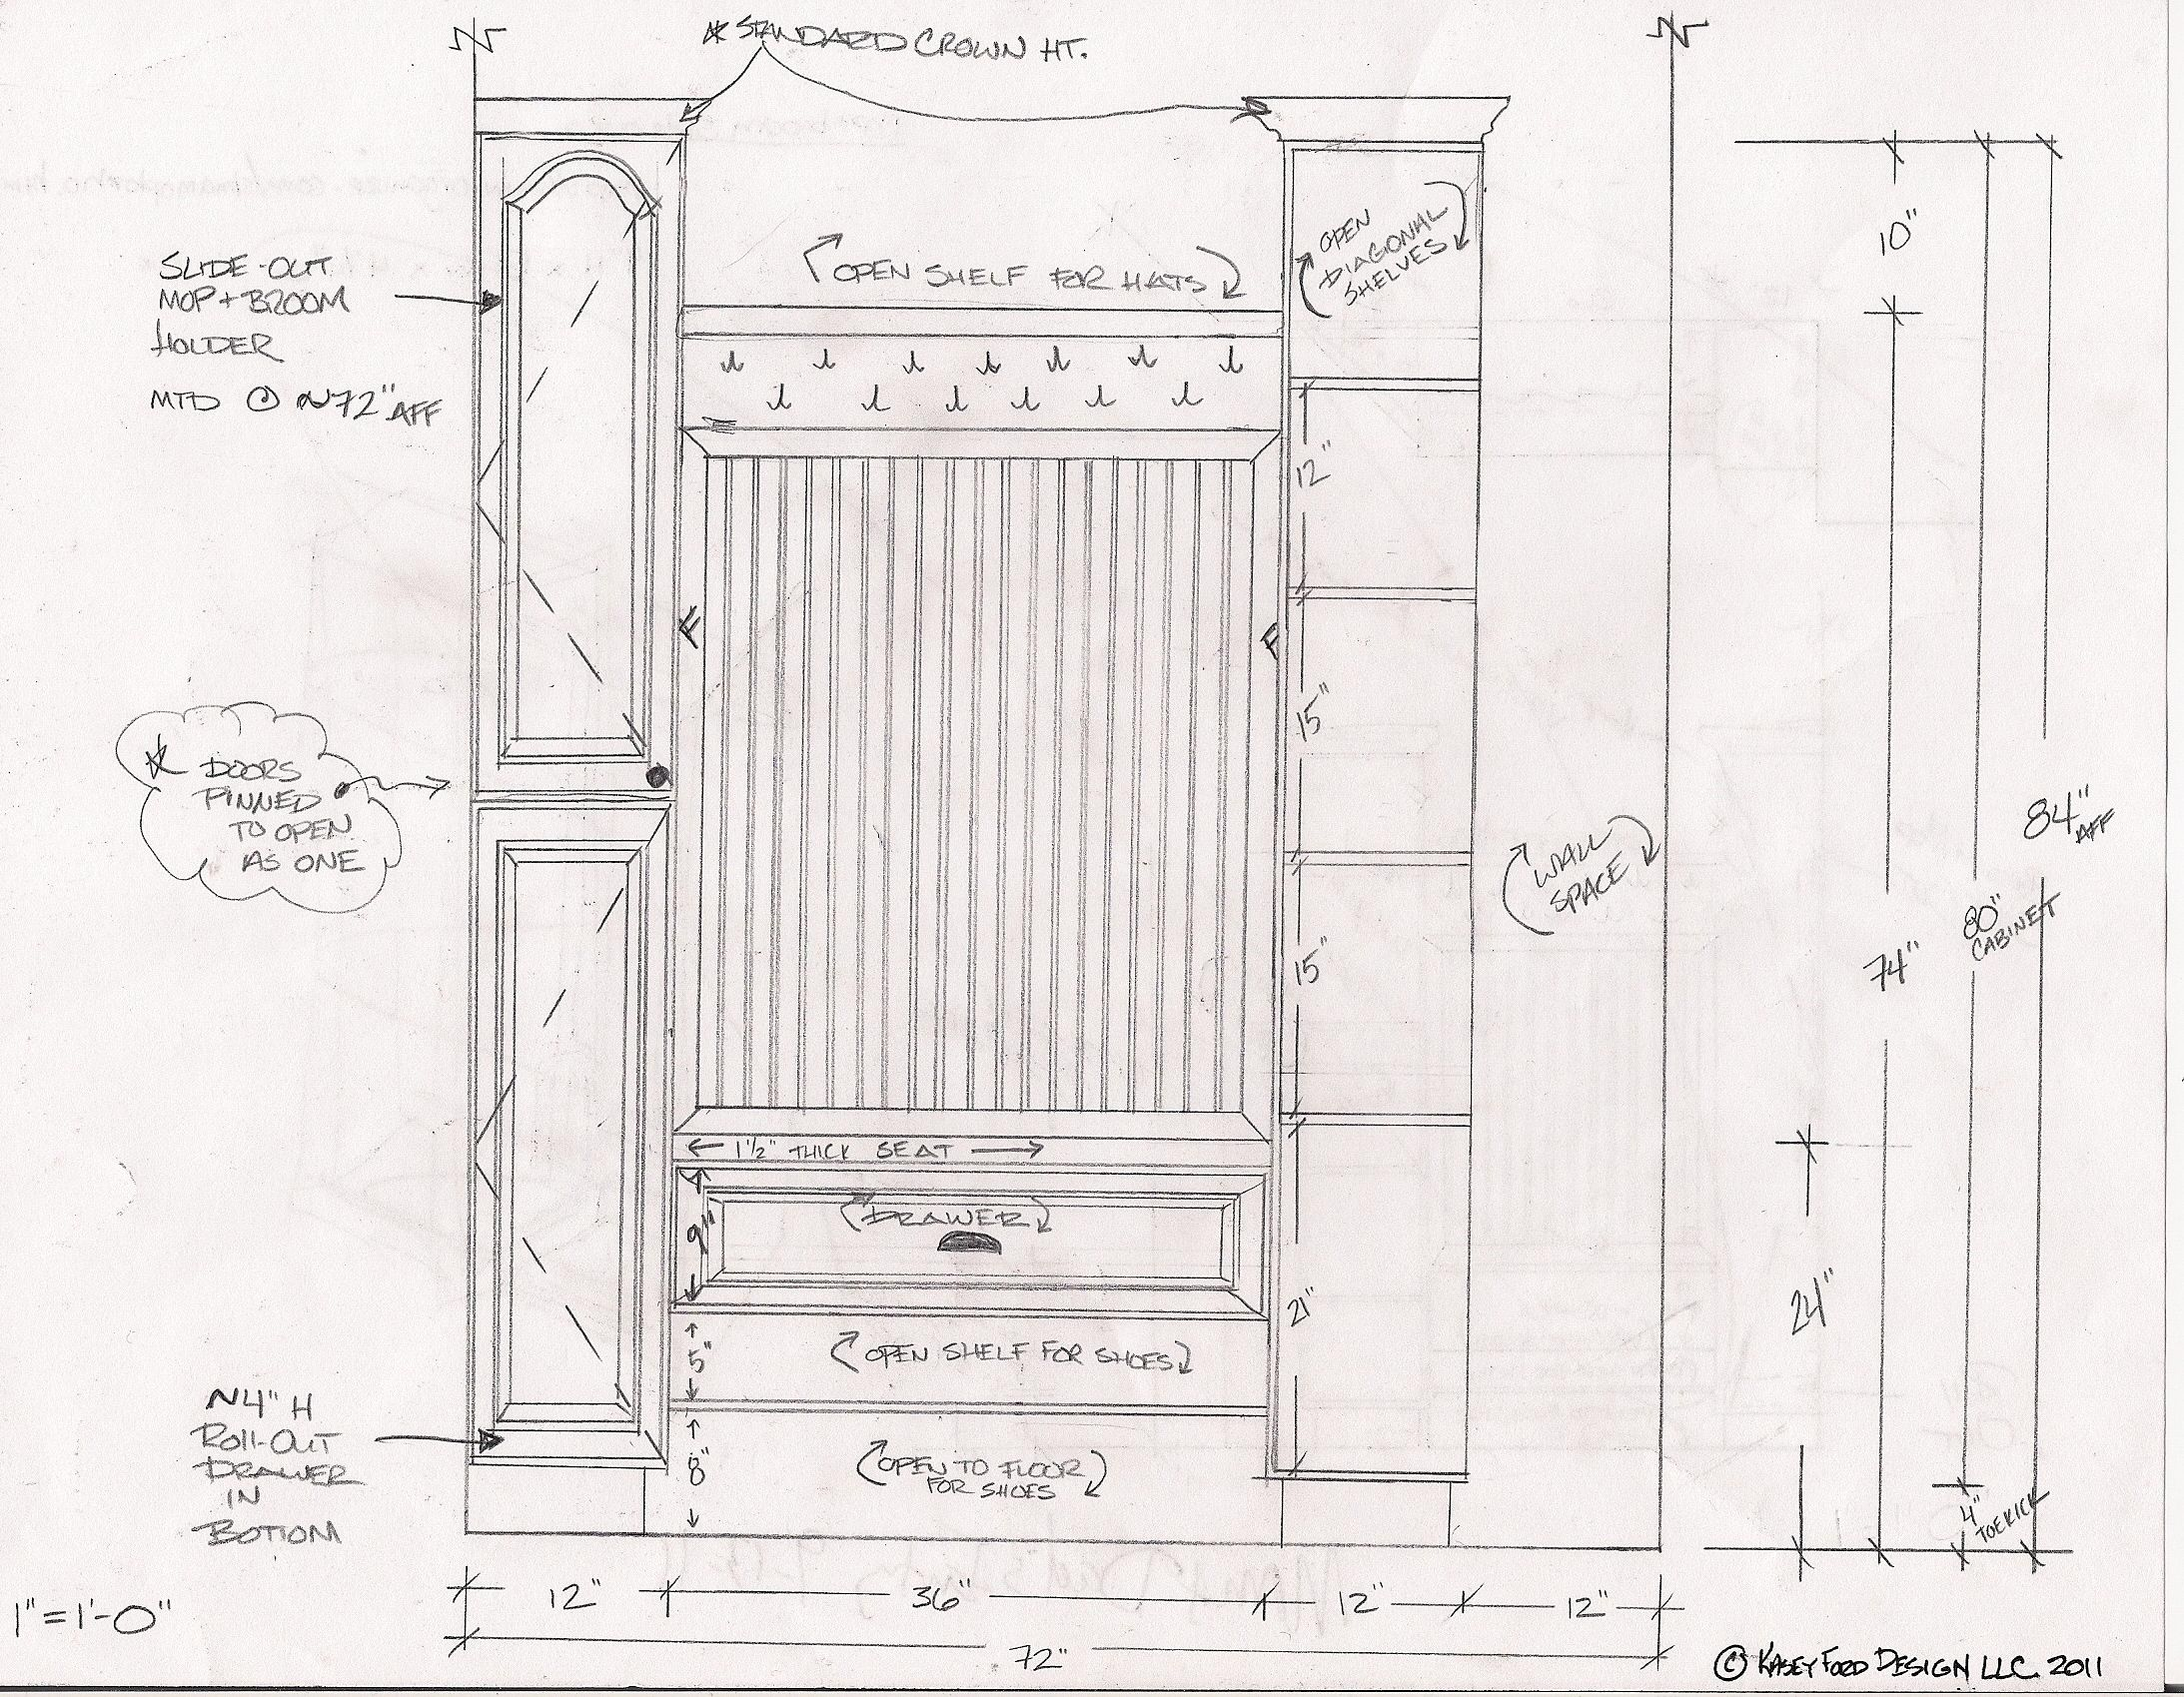 Closet Design For Extraordinary Walk In Closet Depth Minimum Closet Designs Kitchen And Bath Design Entryway Closet